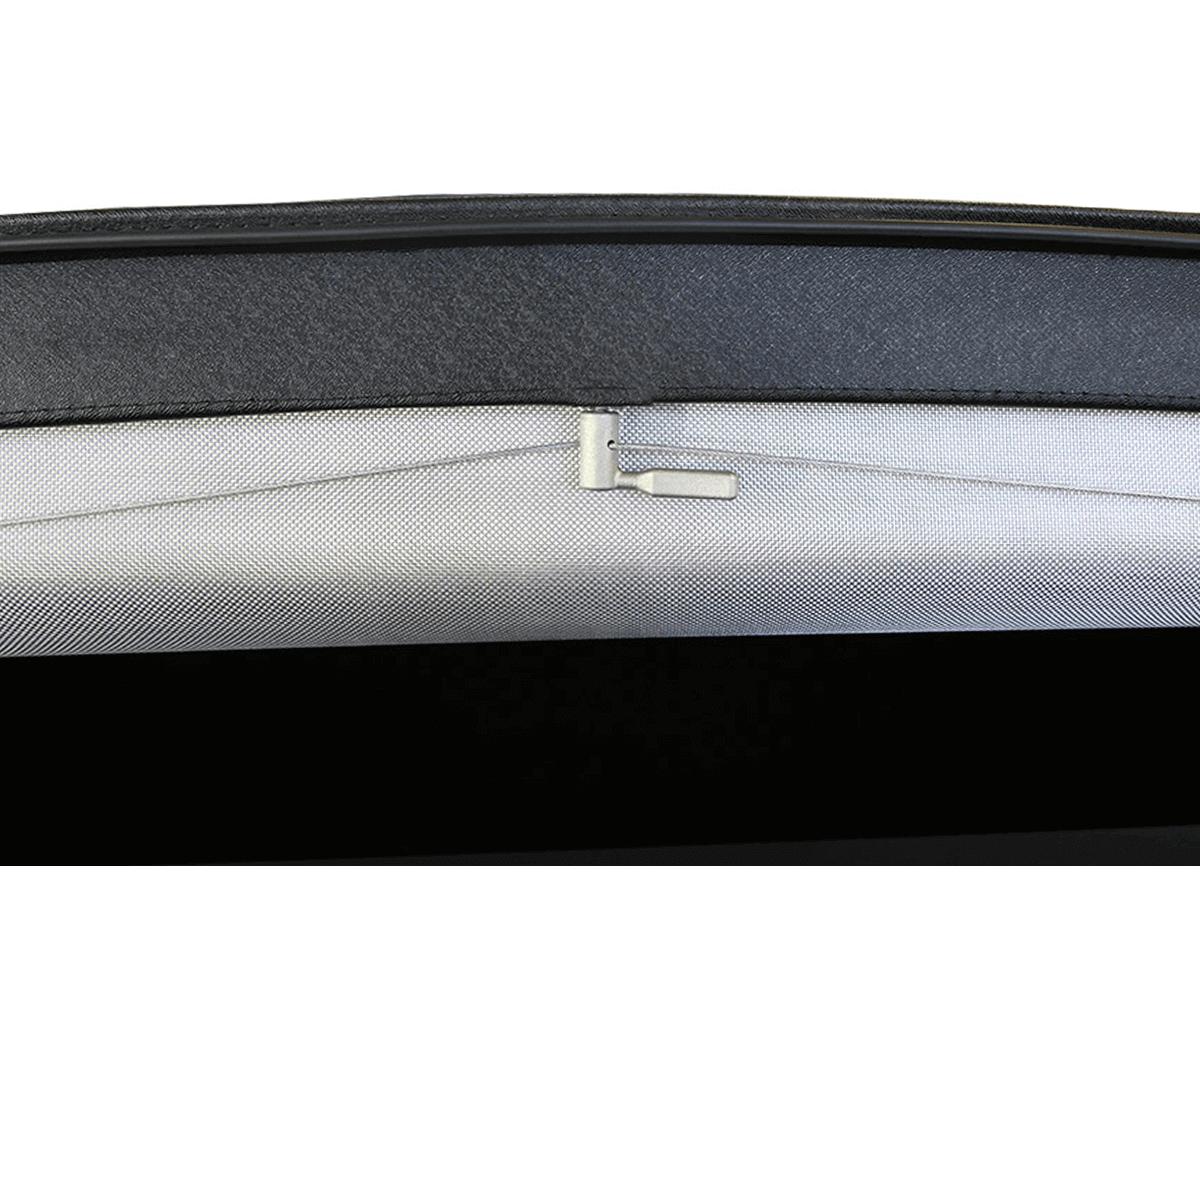 Capota marítima Flash Roller Premium Nova Strada cabine dupla 2021 2022 Freedom Endurance